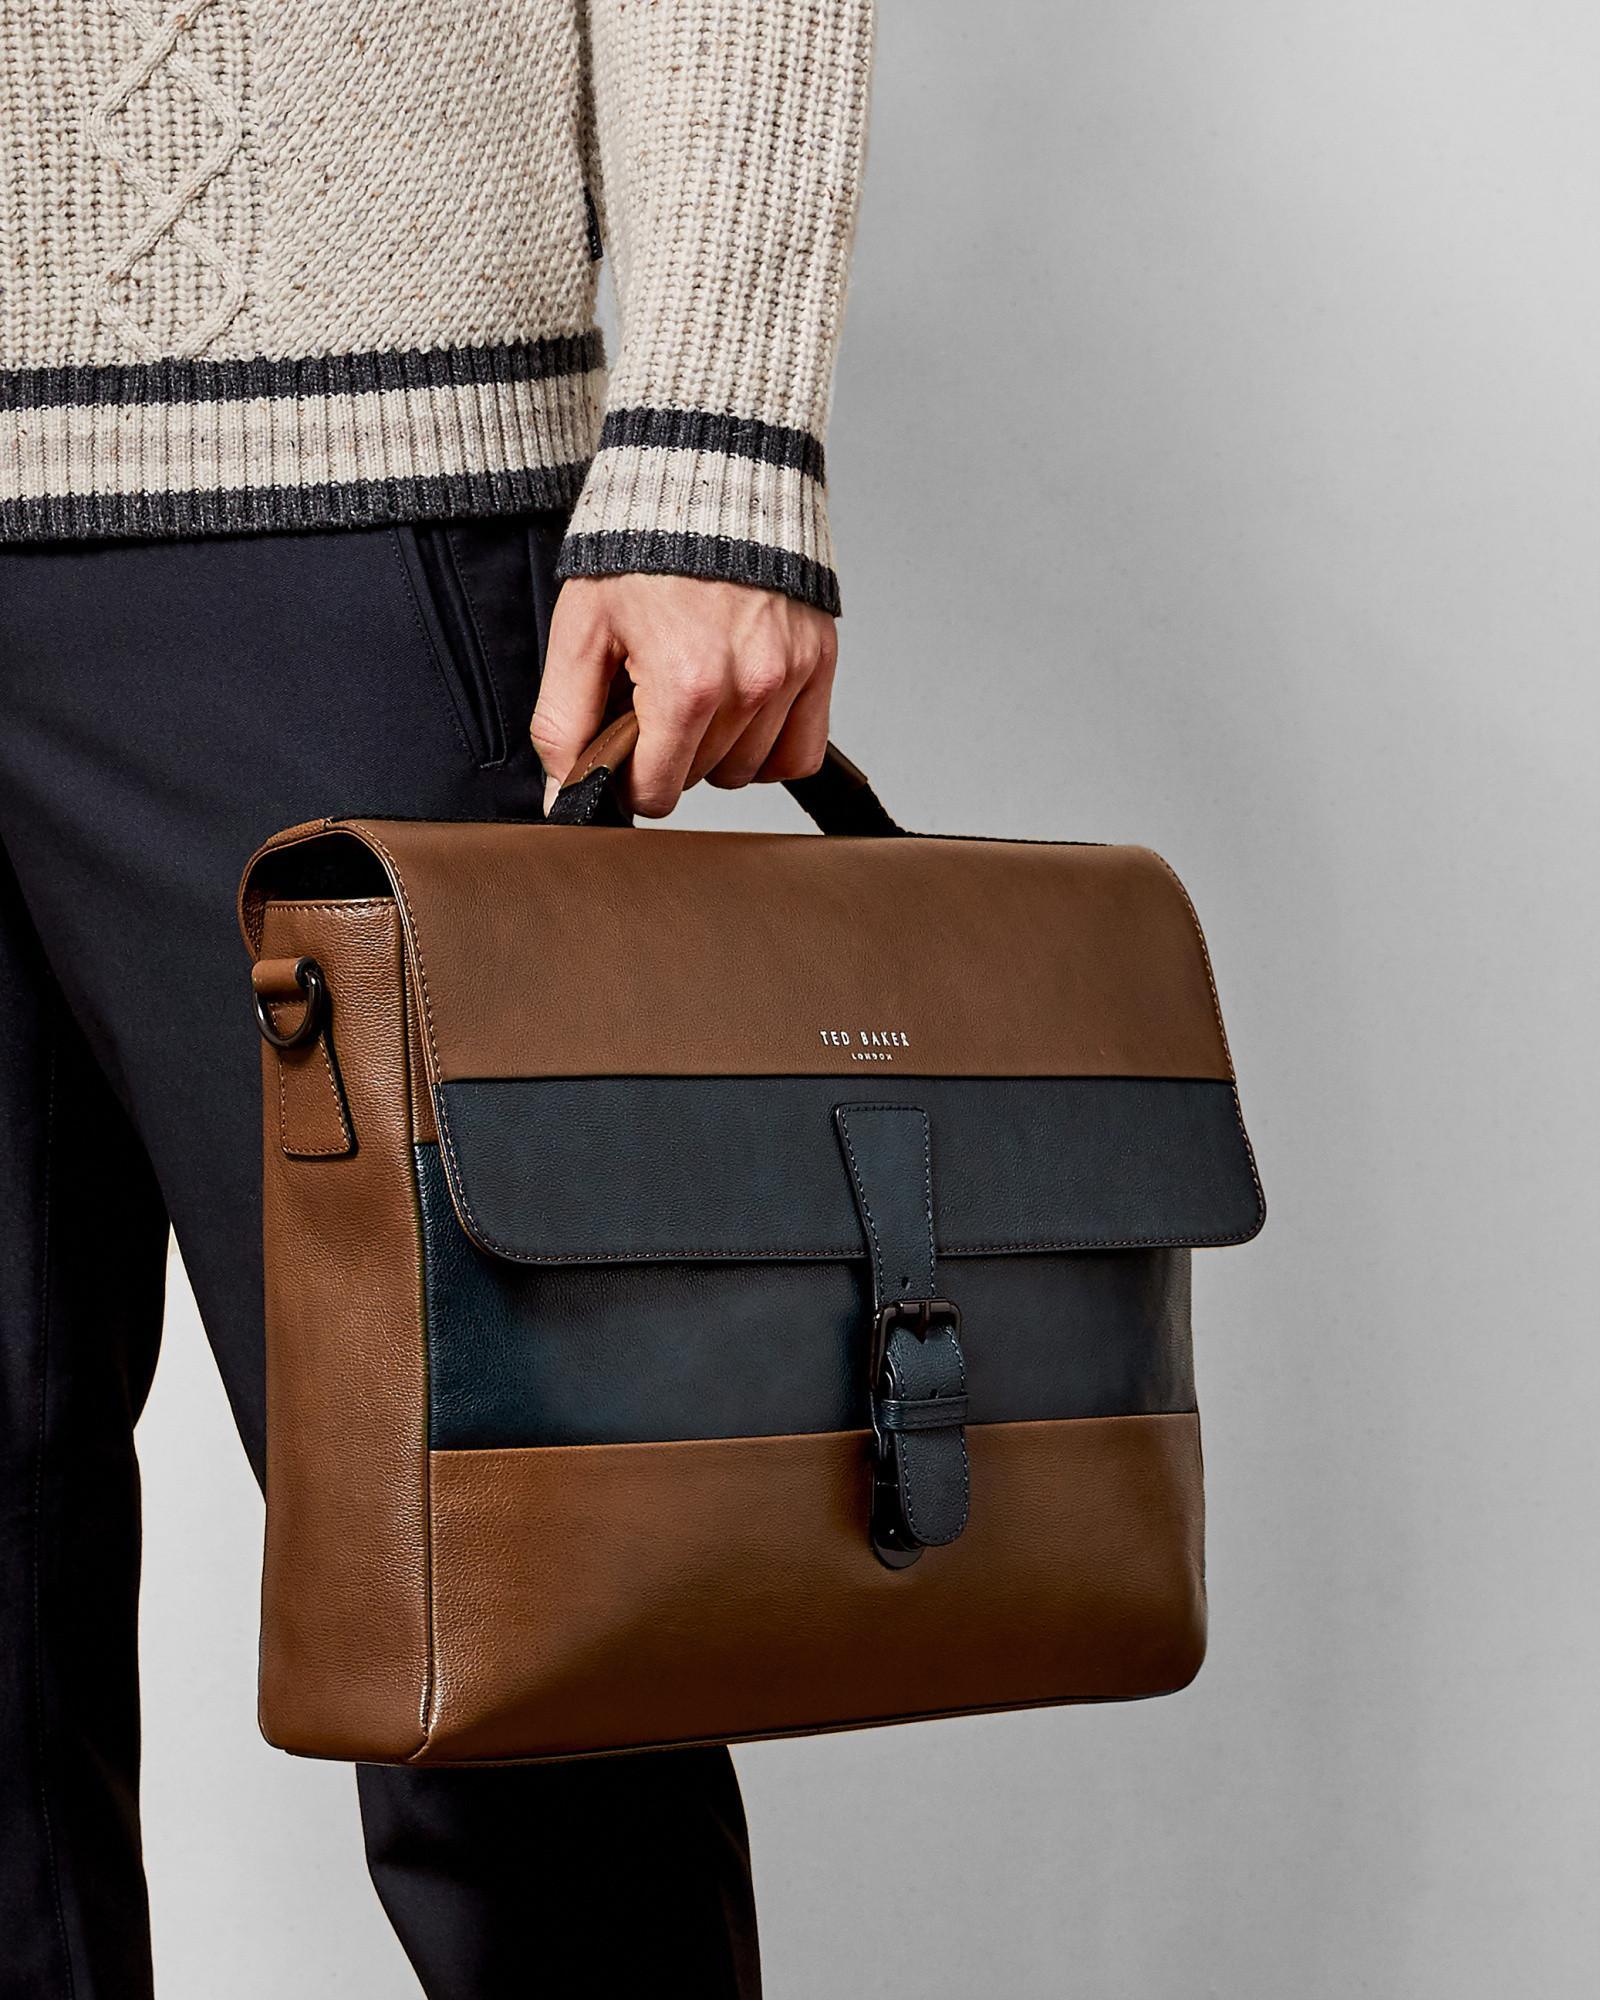 ce7da1005 Ted Baker Striped Leather Messenger Bag for Men - Lyst